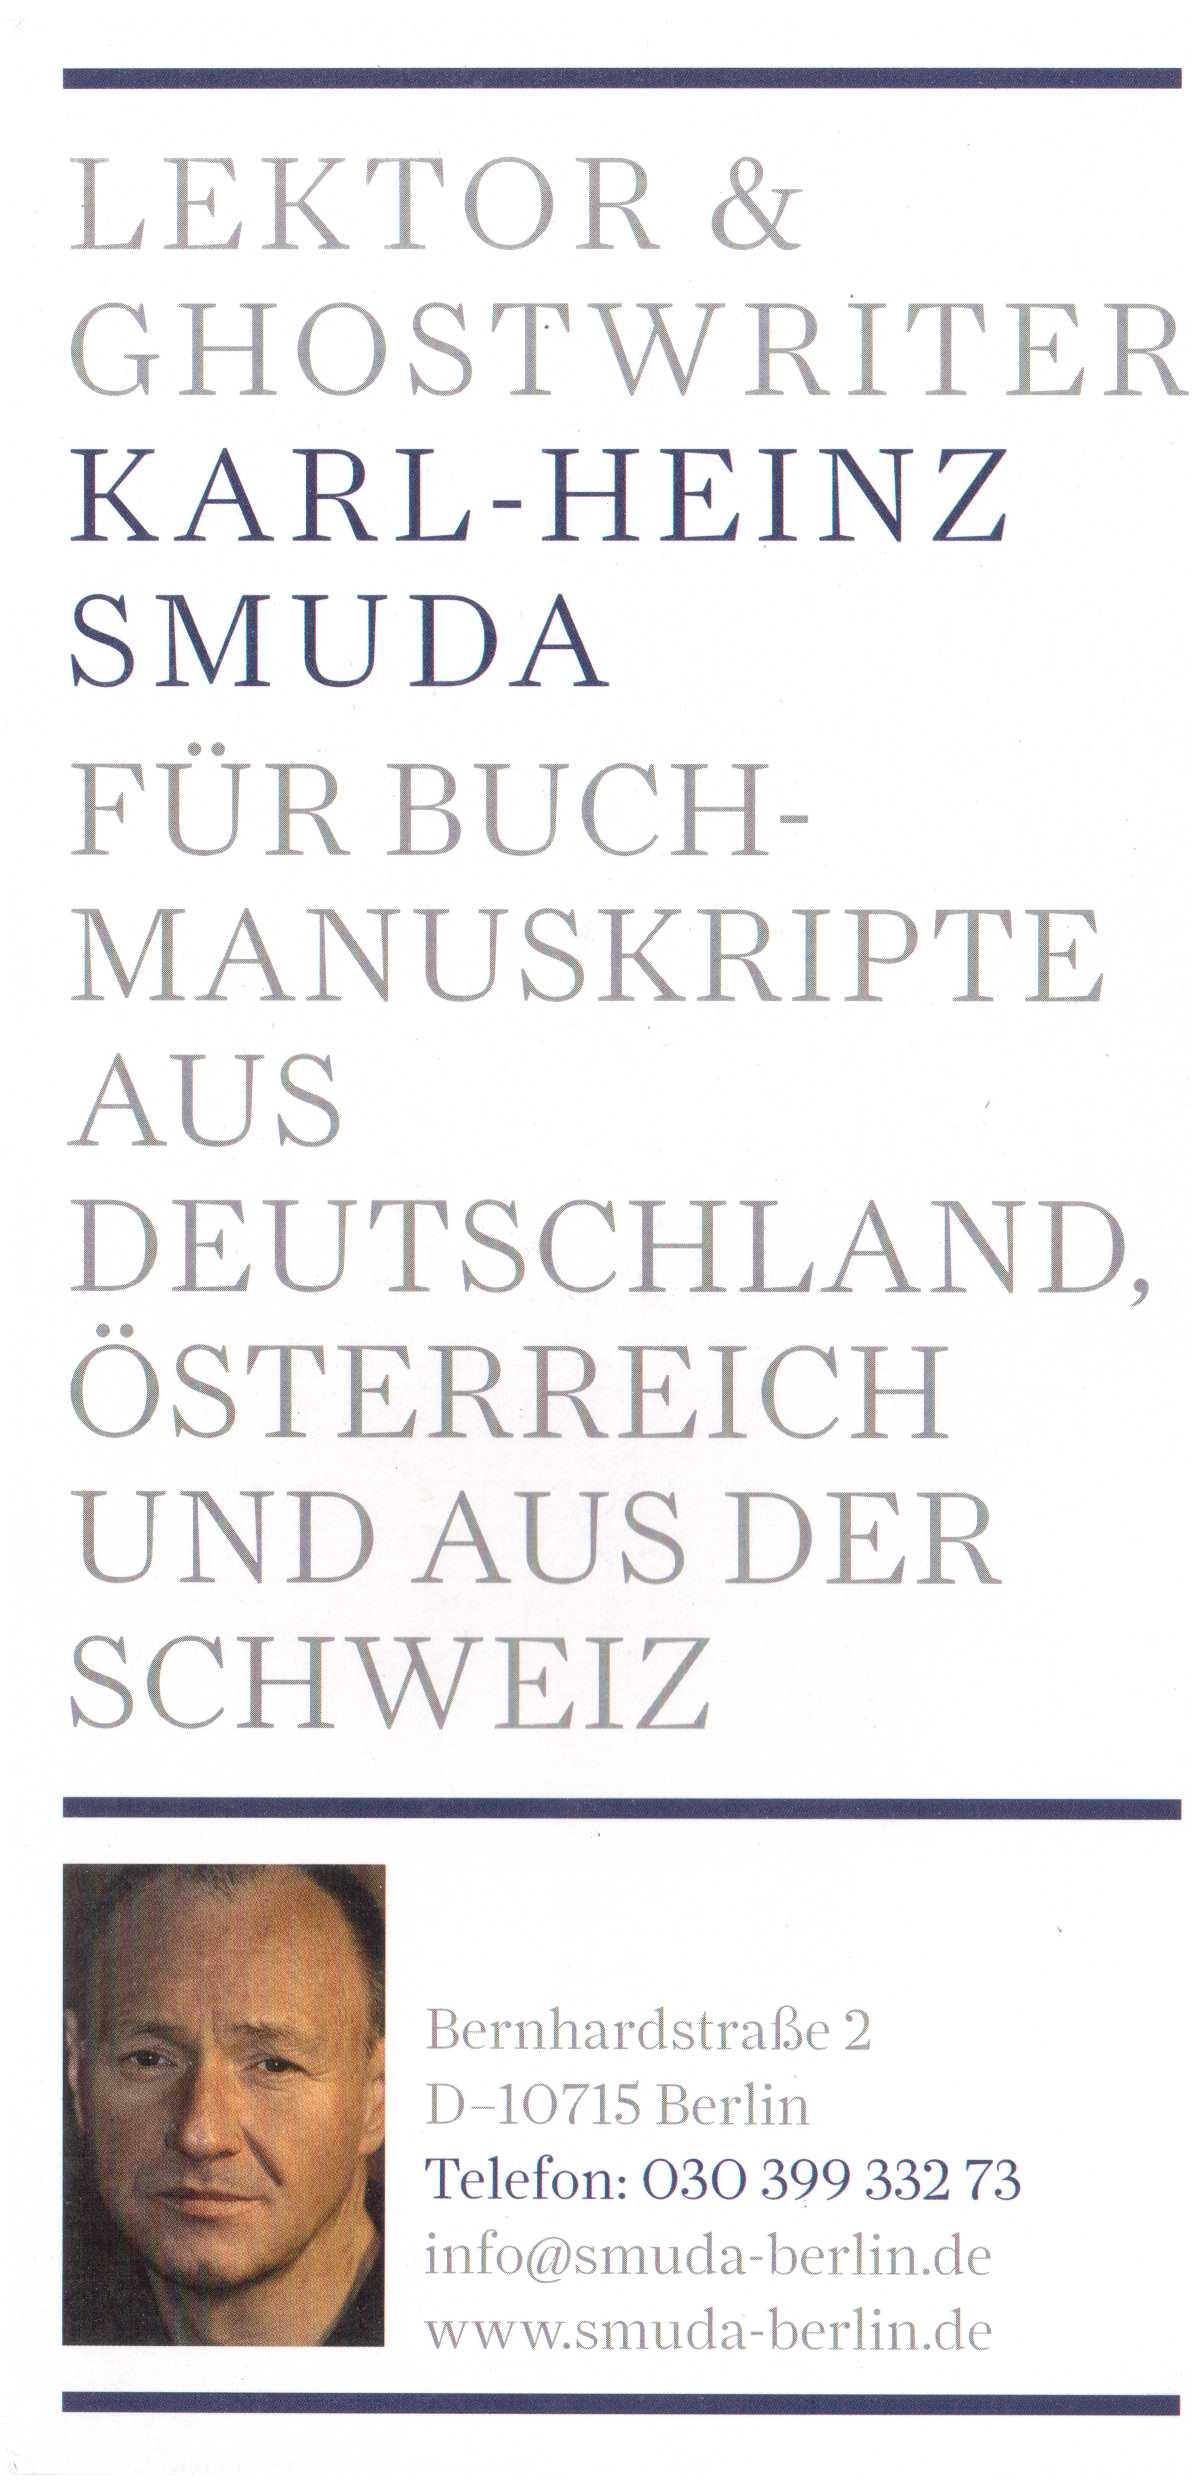 Lektor Karl-Heinz Smuda